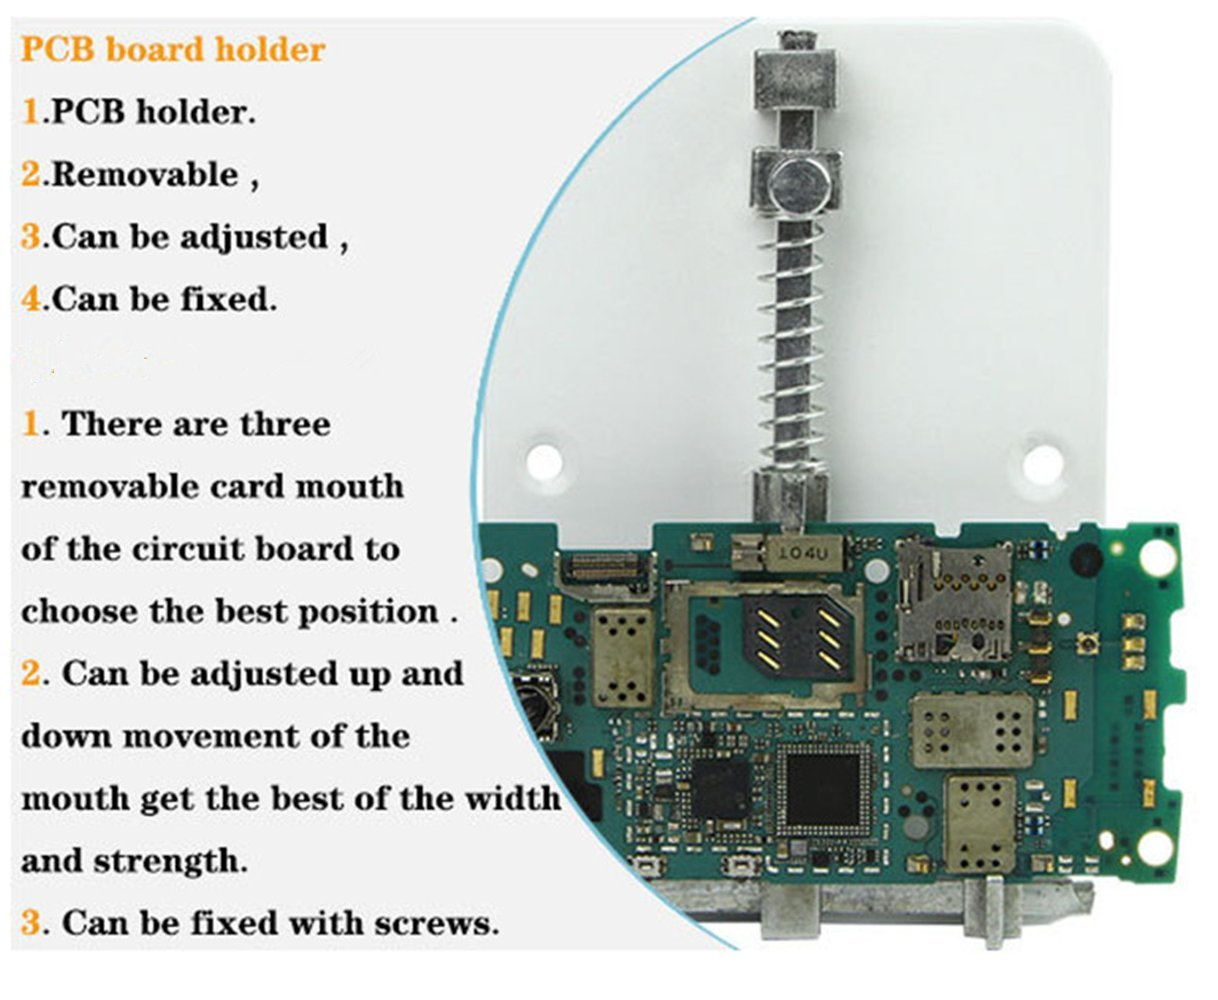 Loyeh Pcb Circuit Board Holder Adjustable For Soldering And Any Metal Repairing Repair Tool Mobile Phone Pda Mp3 White Tools Home Improvement